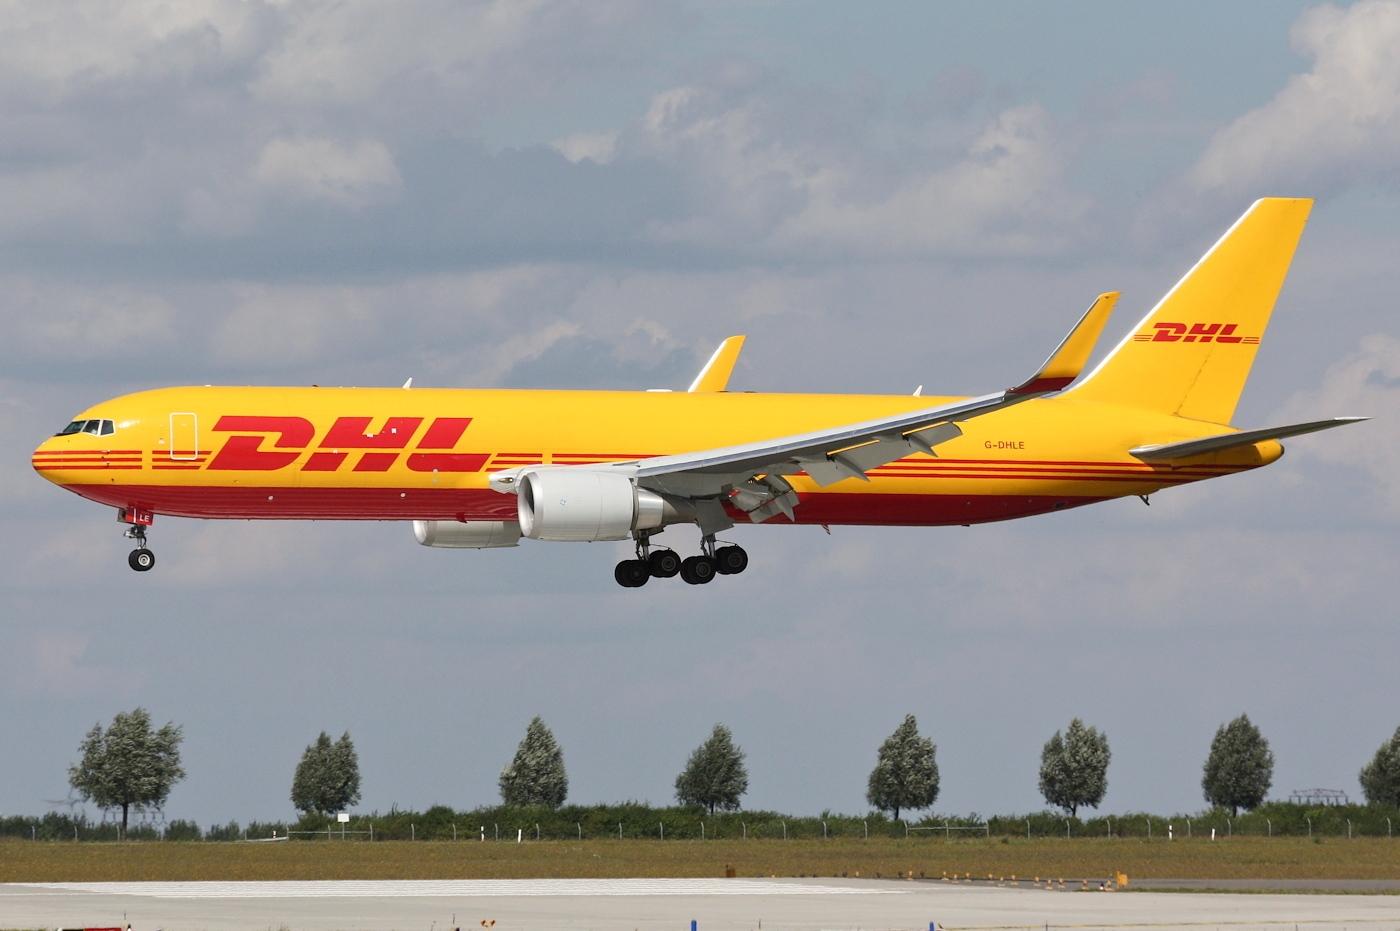 DHL国际快递 DHL燃油附加费 FedEx燃油附加费 UPS燃油附加费 TNT燃油附加费 燃油附加费 国际快递 鹿跃国际快递 国际快递燃油附加费